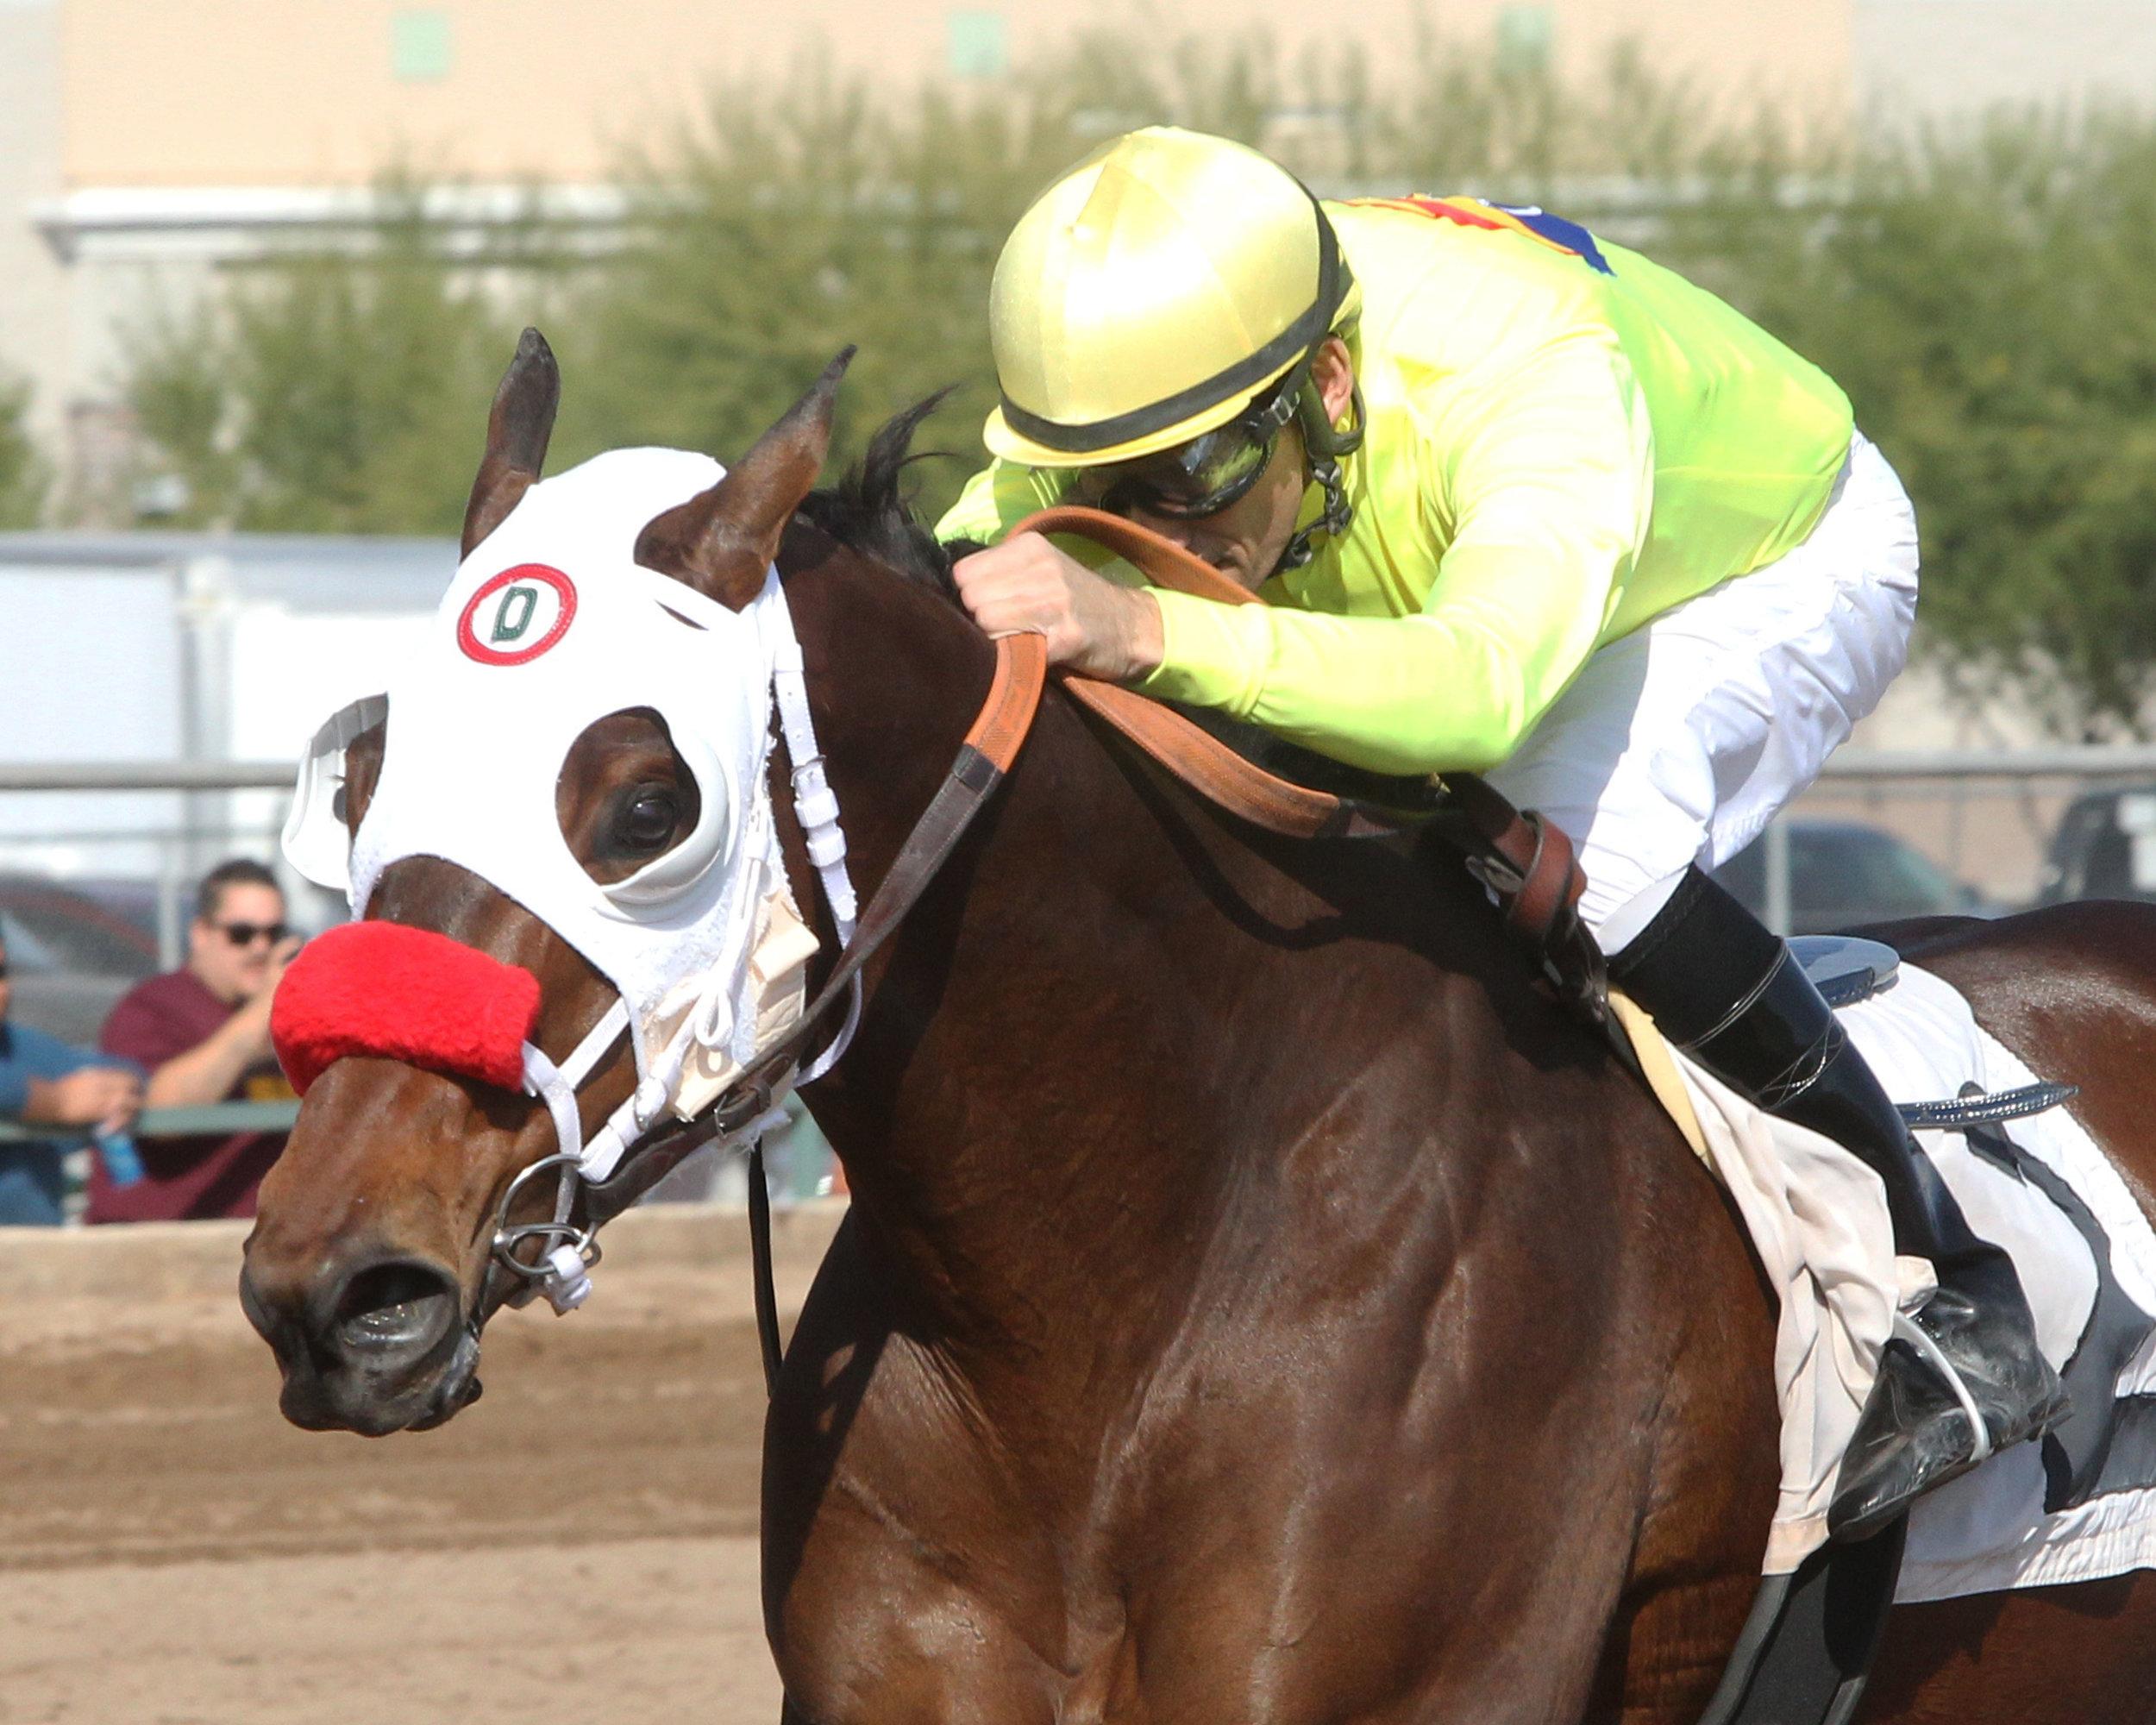 Omar - Caballos Del Sol Stakes - 11-15-14 - R03 - TUP - Inside Finish (2).jpg